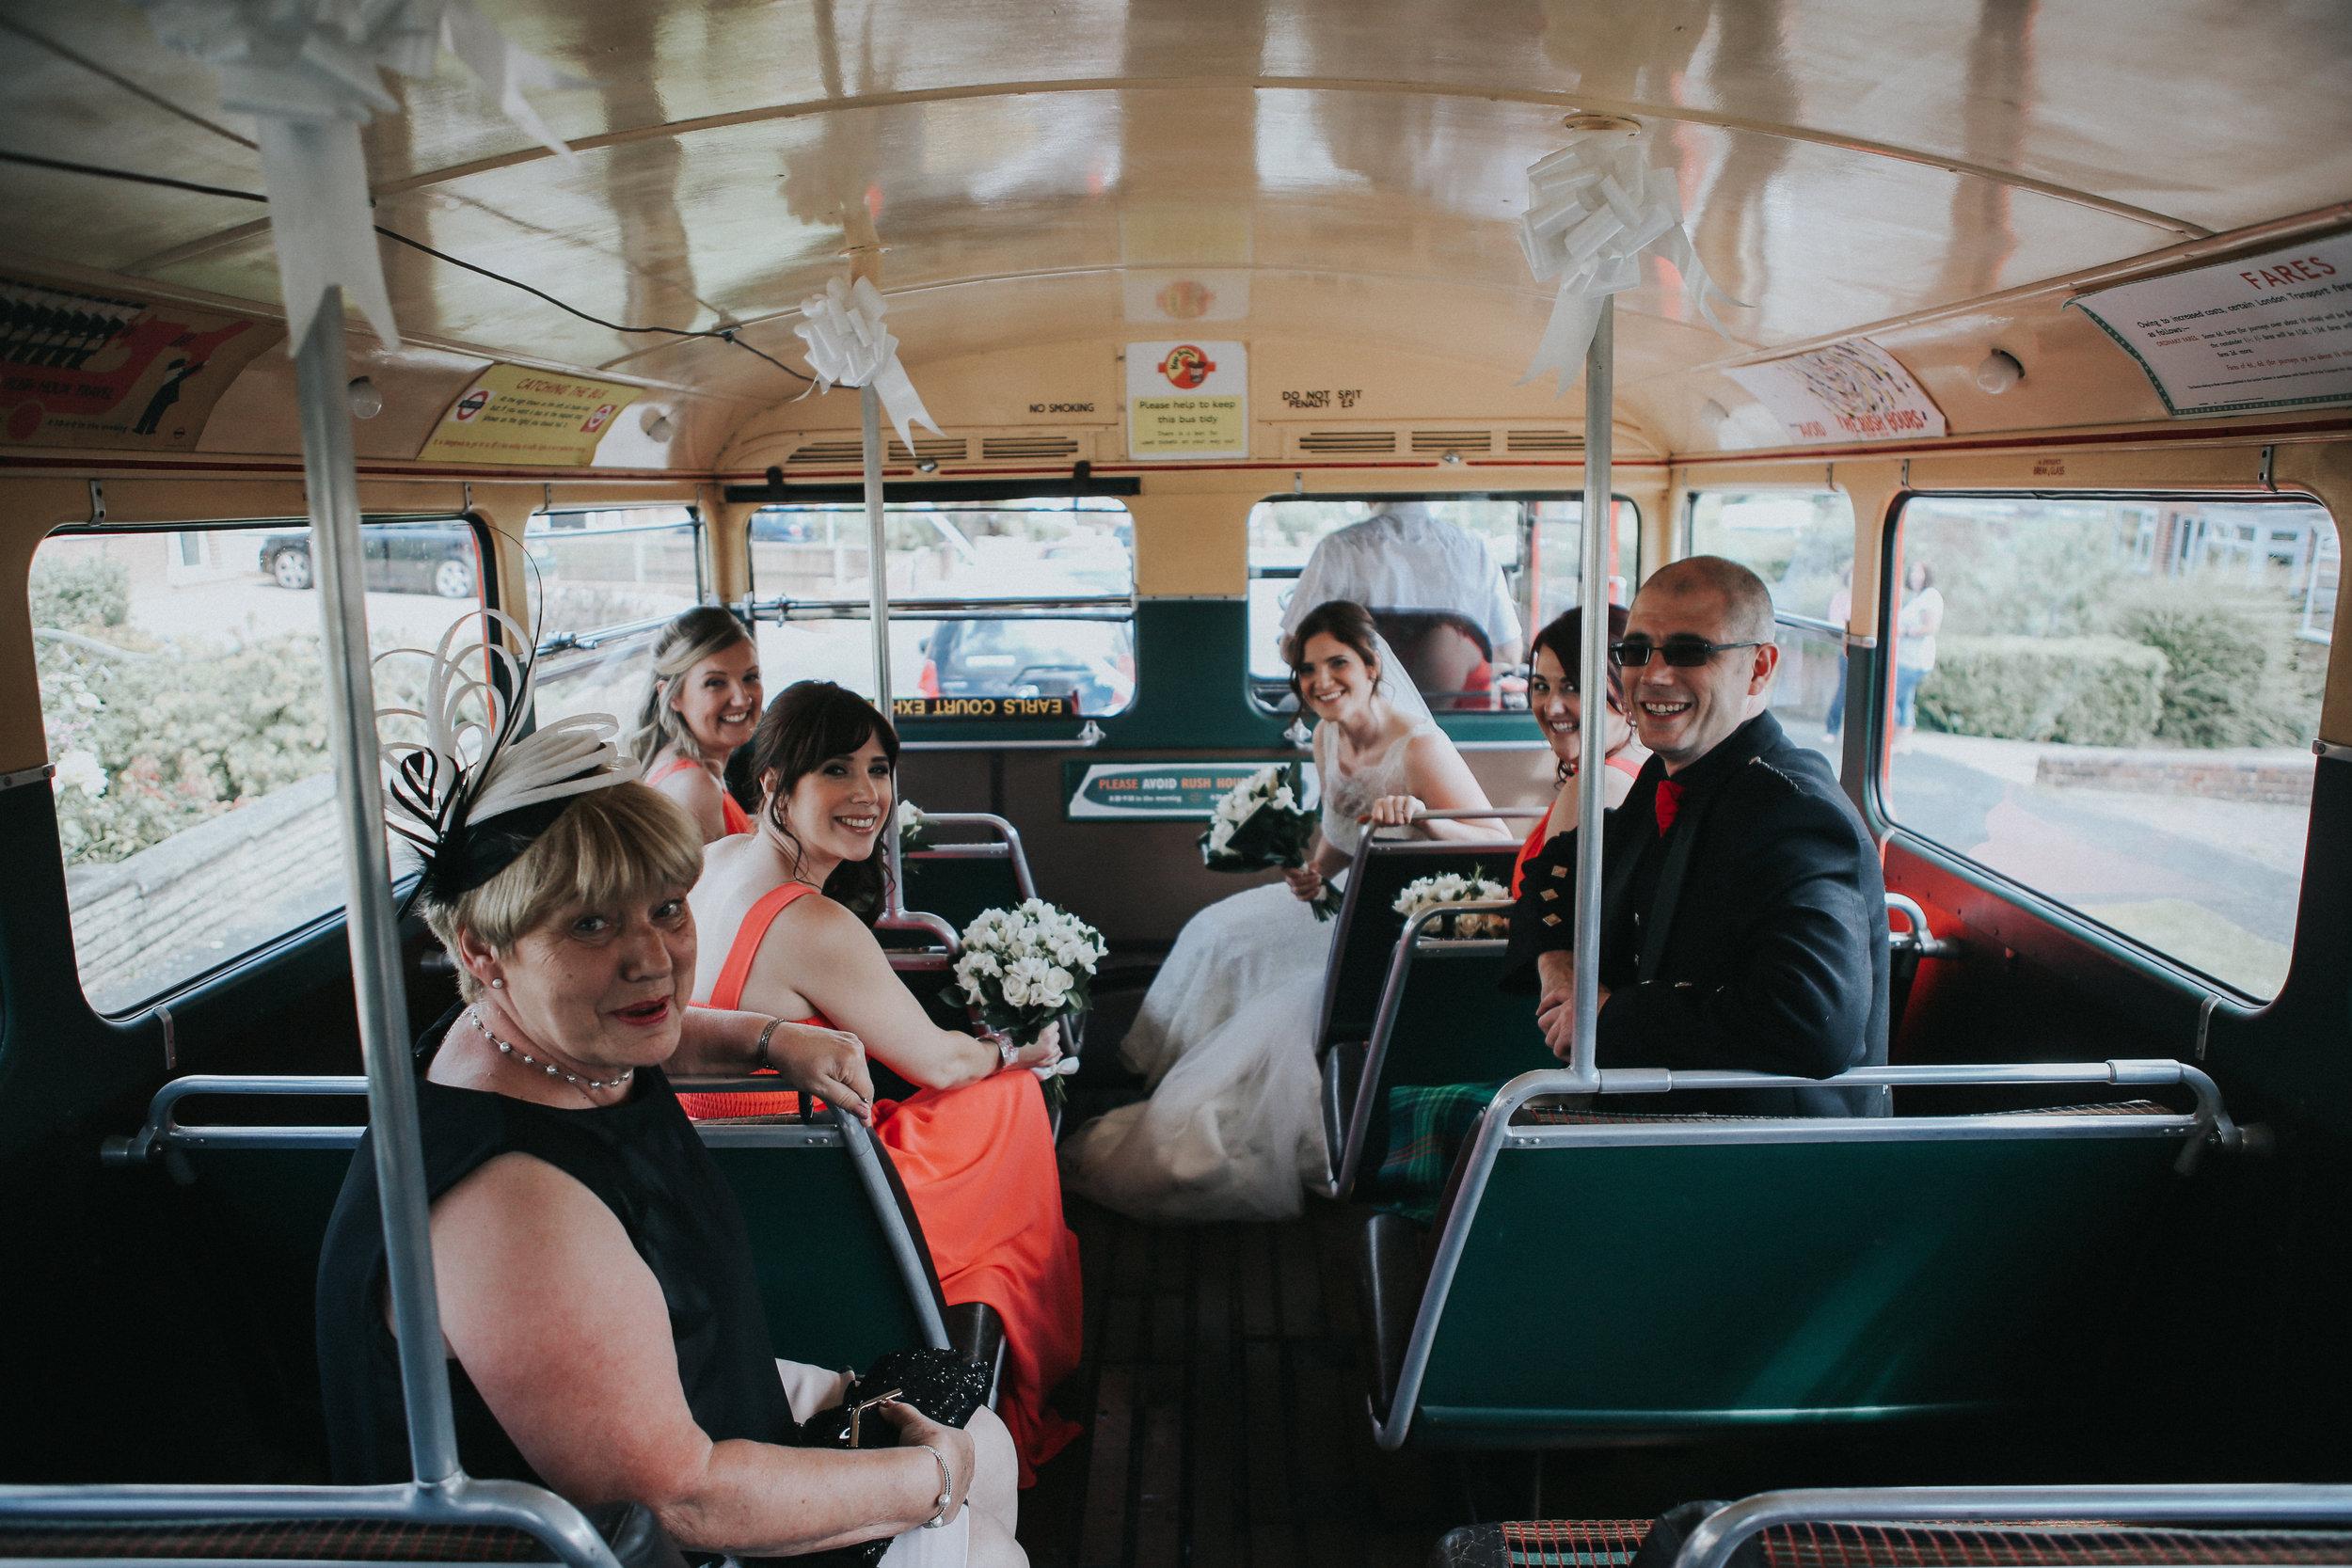 reigate-surrey-london-wedding-photography-bridal-prep-routemaster-bus-24